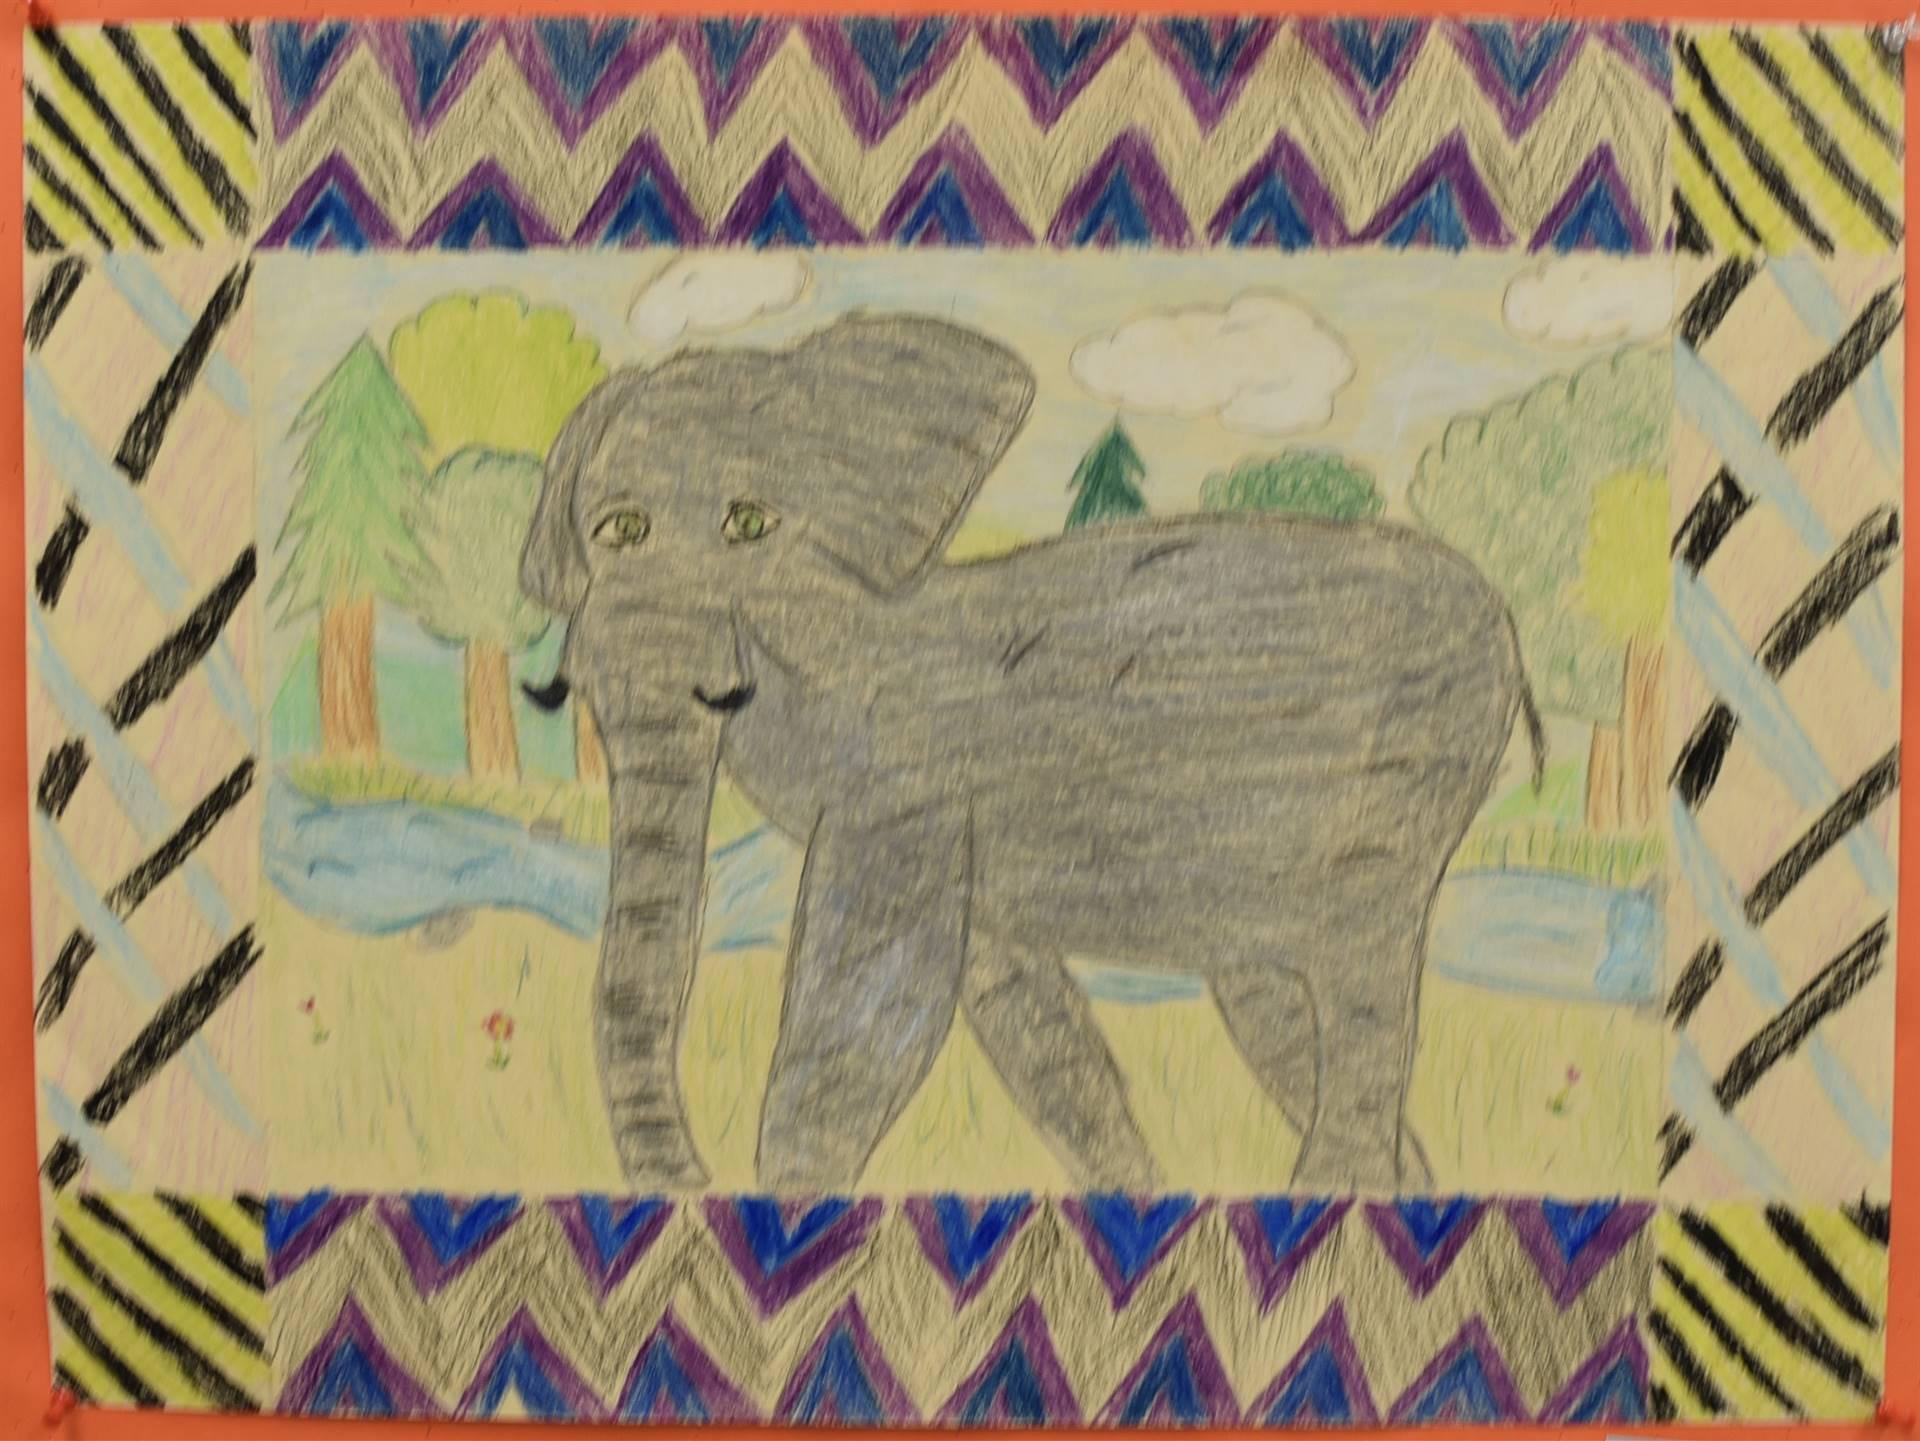 Brecksville-Broadview Hts. Middle School Art Projects 99